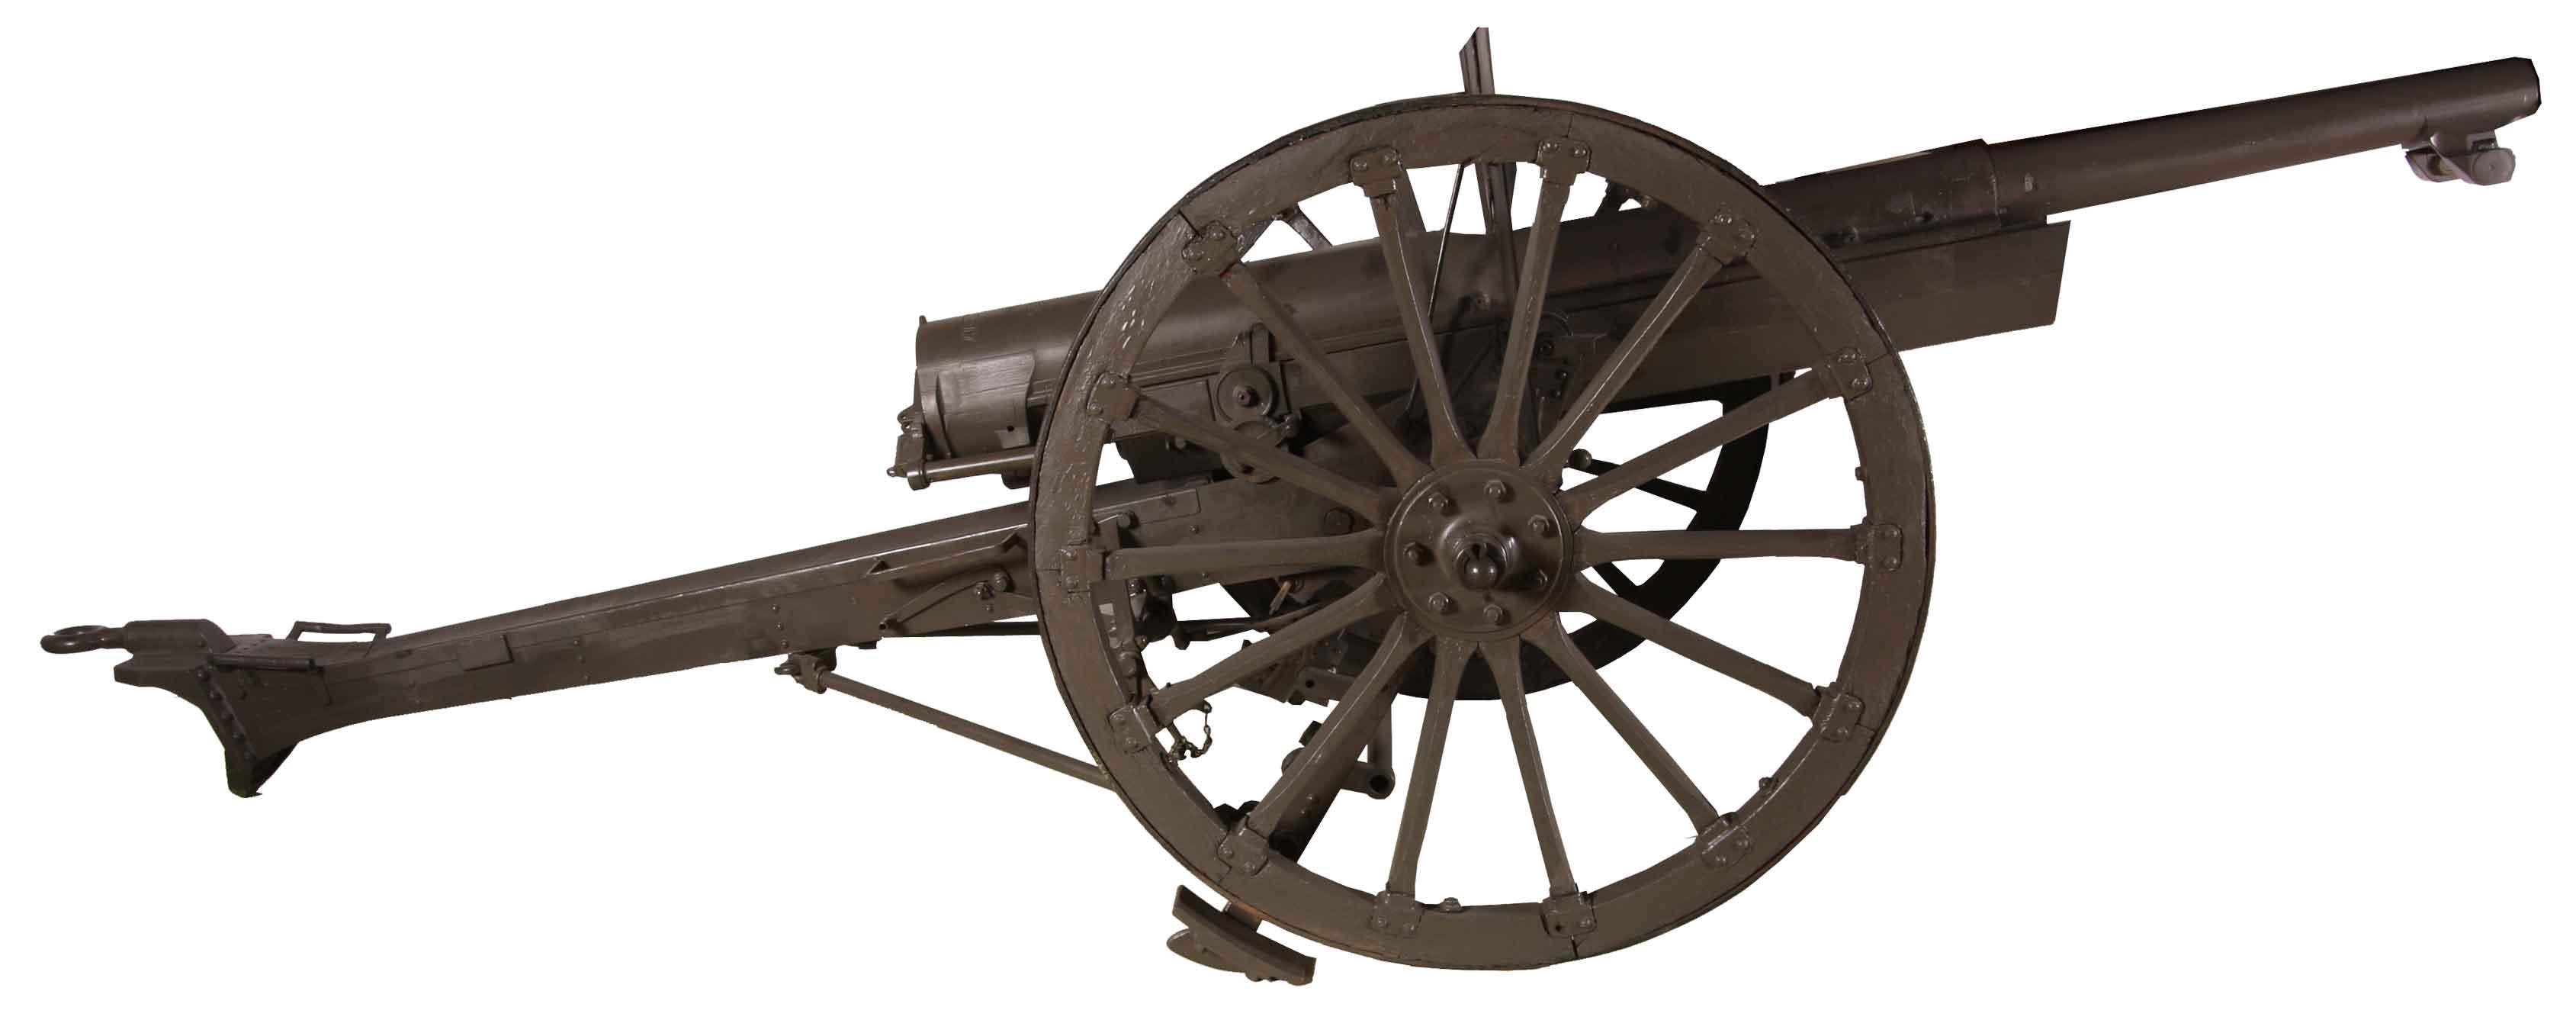 Armata polowa wz. 1897 kal. 75 mm